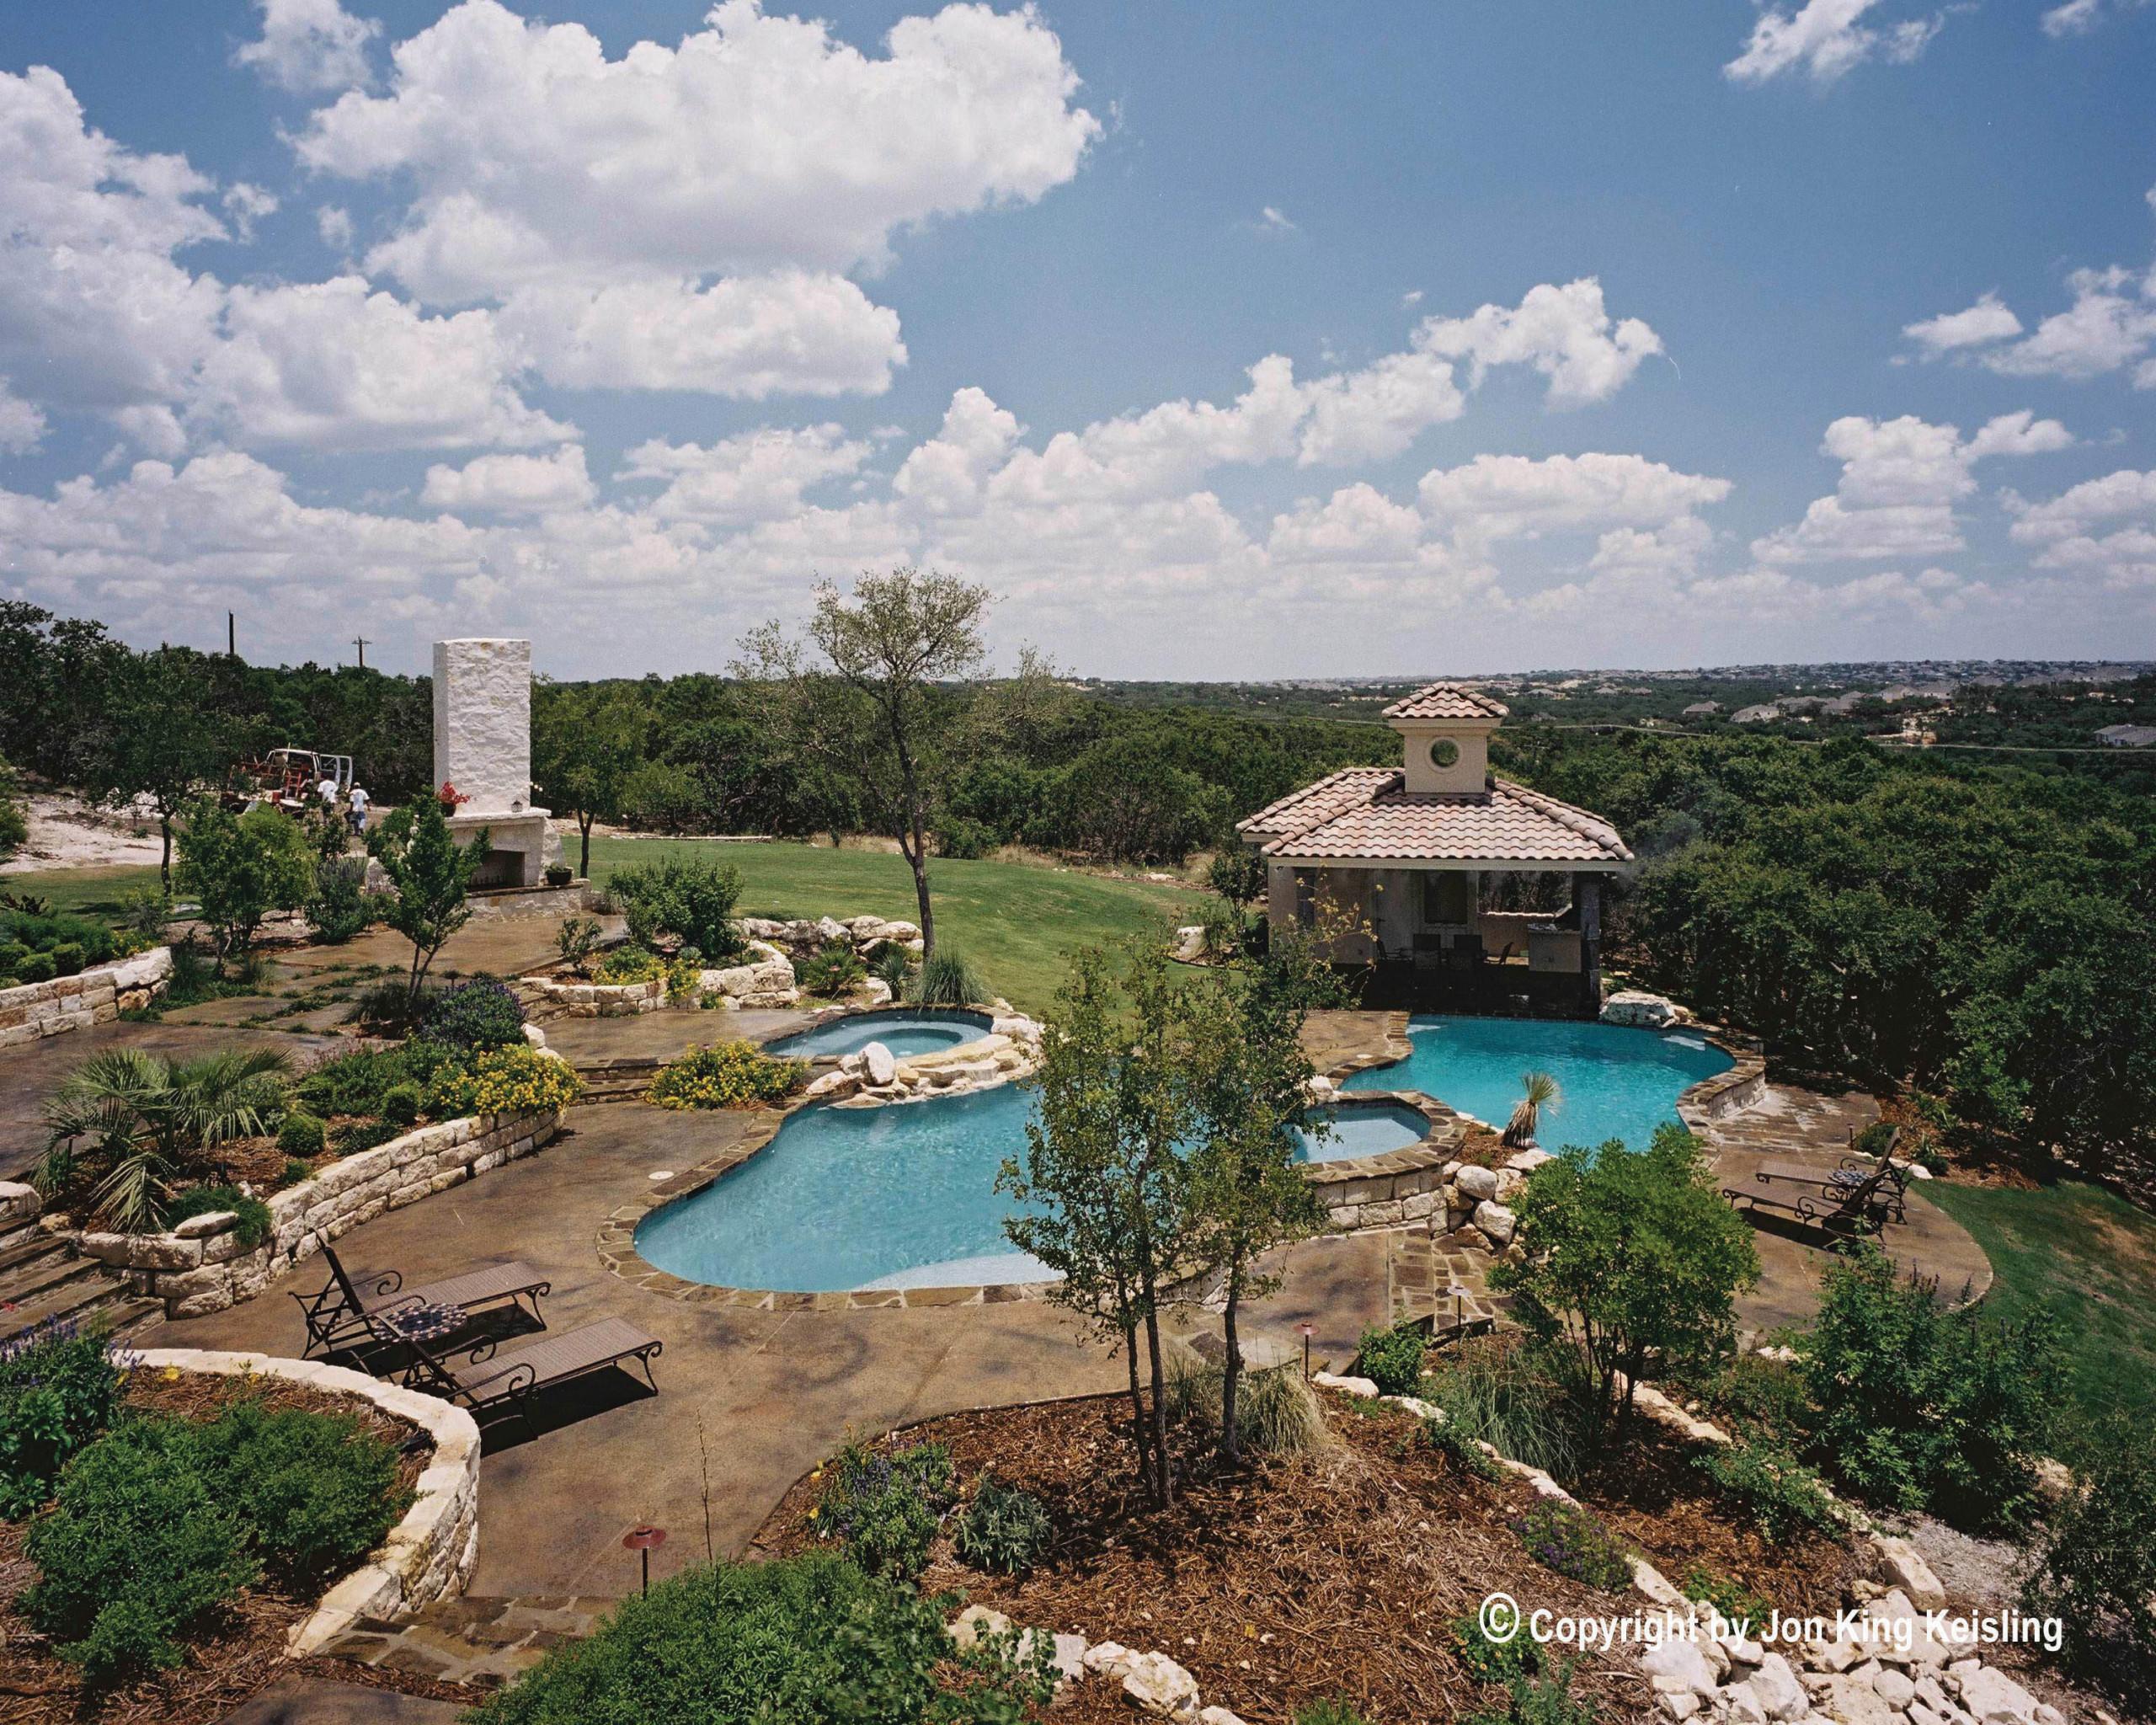 San Antonio Multi-Level Pool/Spa/Landscape